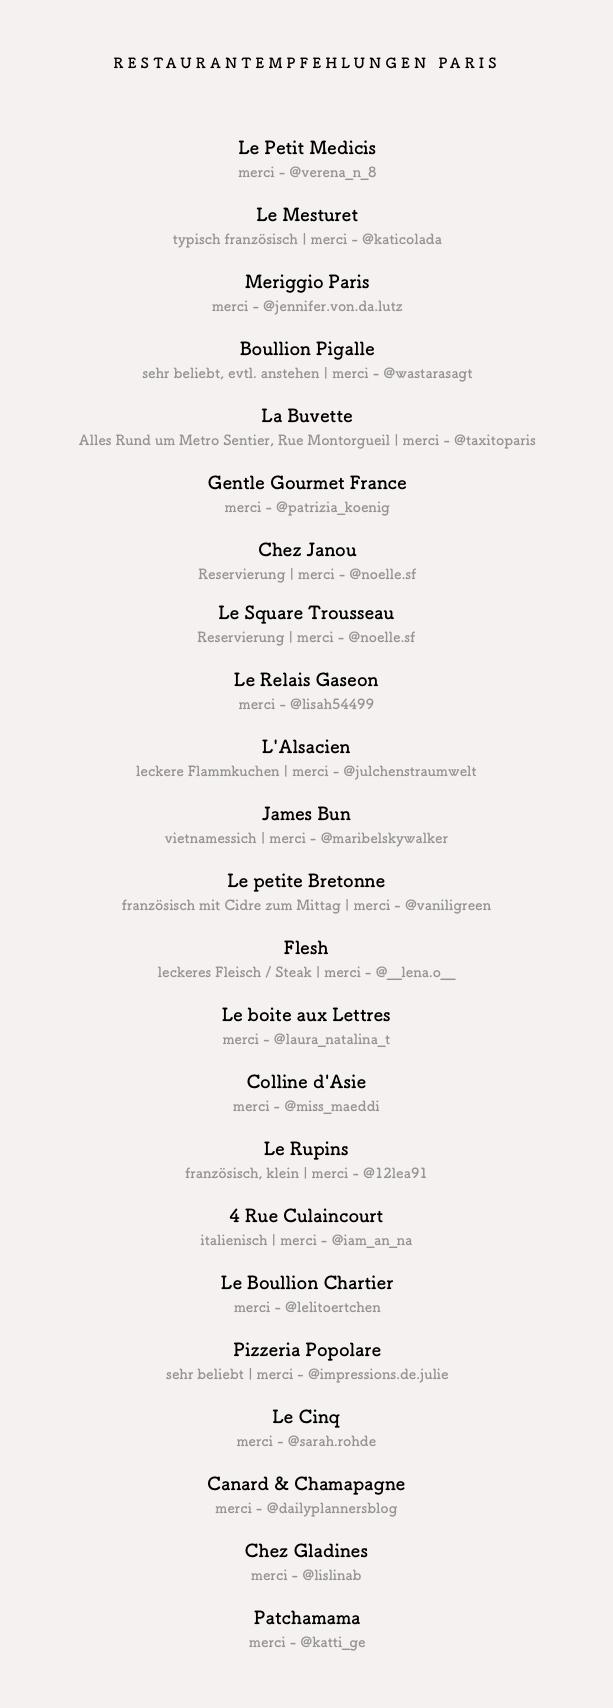 PARIS Regen Tipps | Cafés, Restaurants, Shopping & Baguette